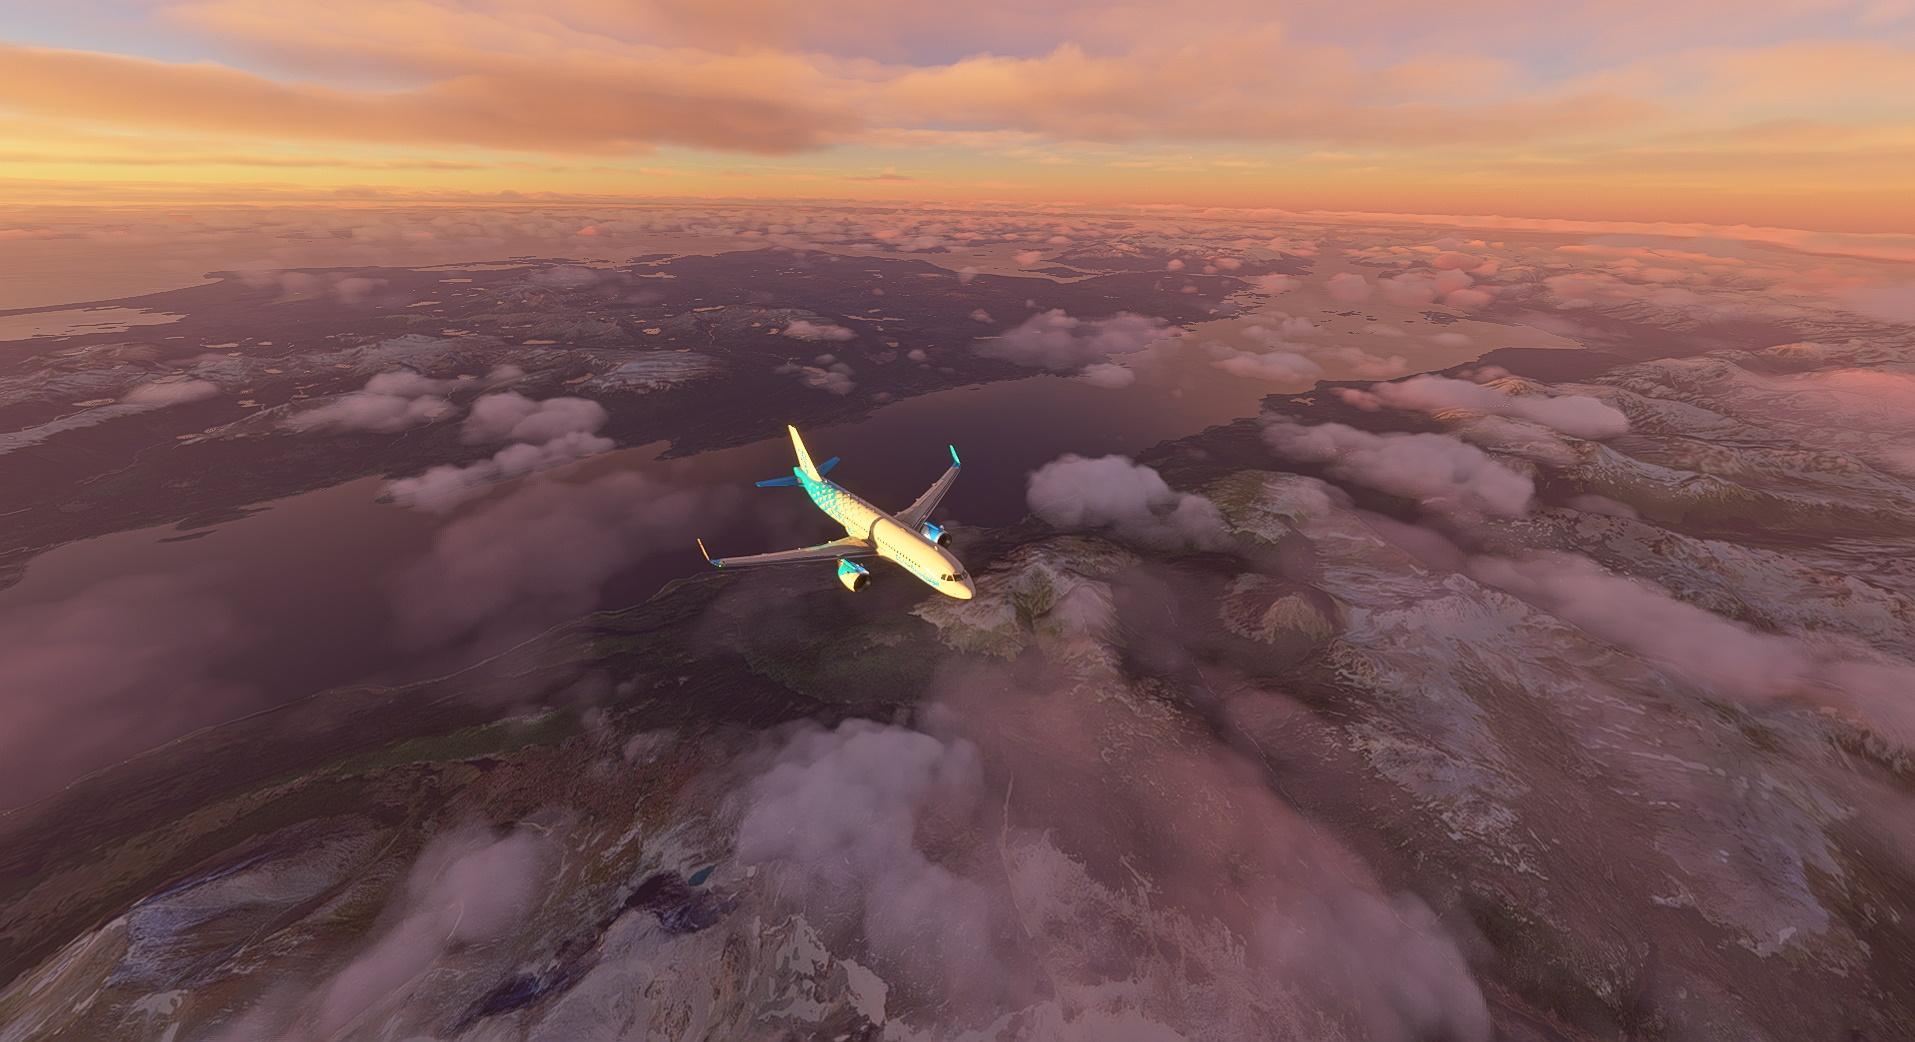 Microsoft Flight Simulator sim world update V 5 Patagonia Aerial